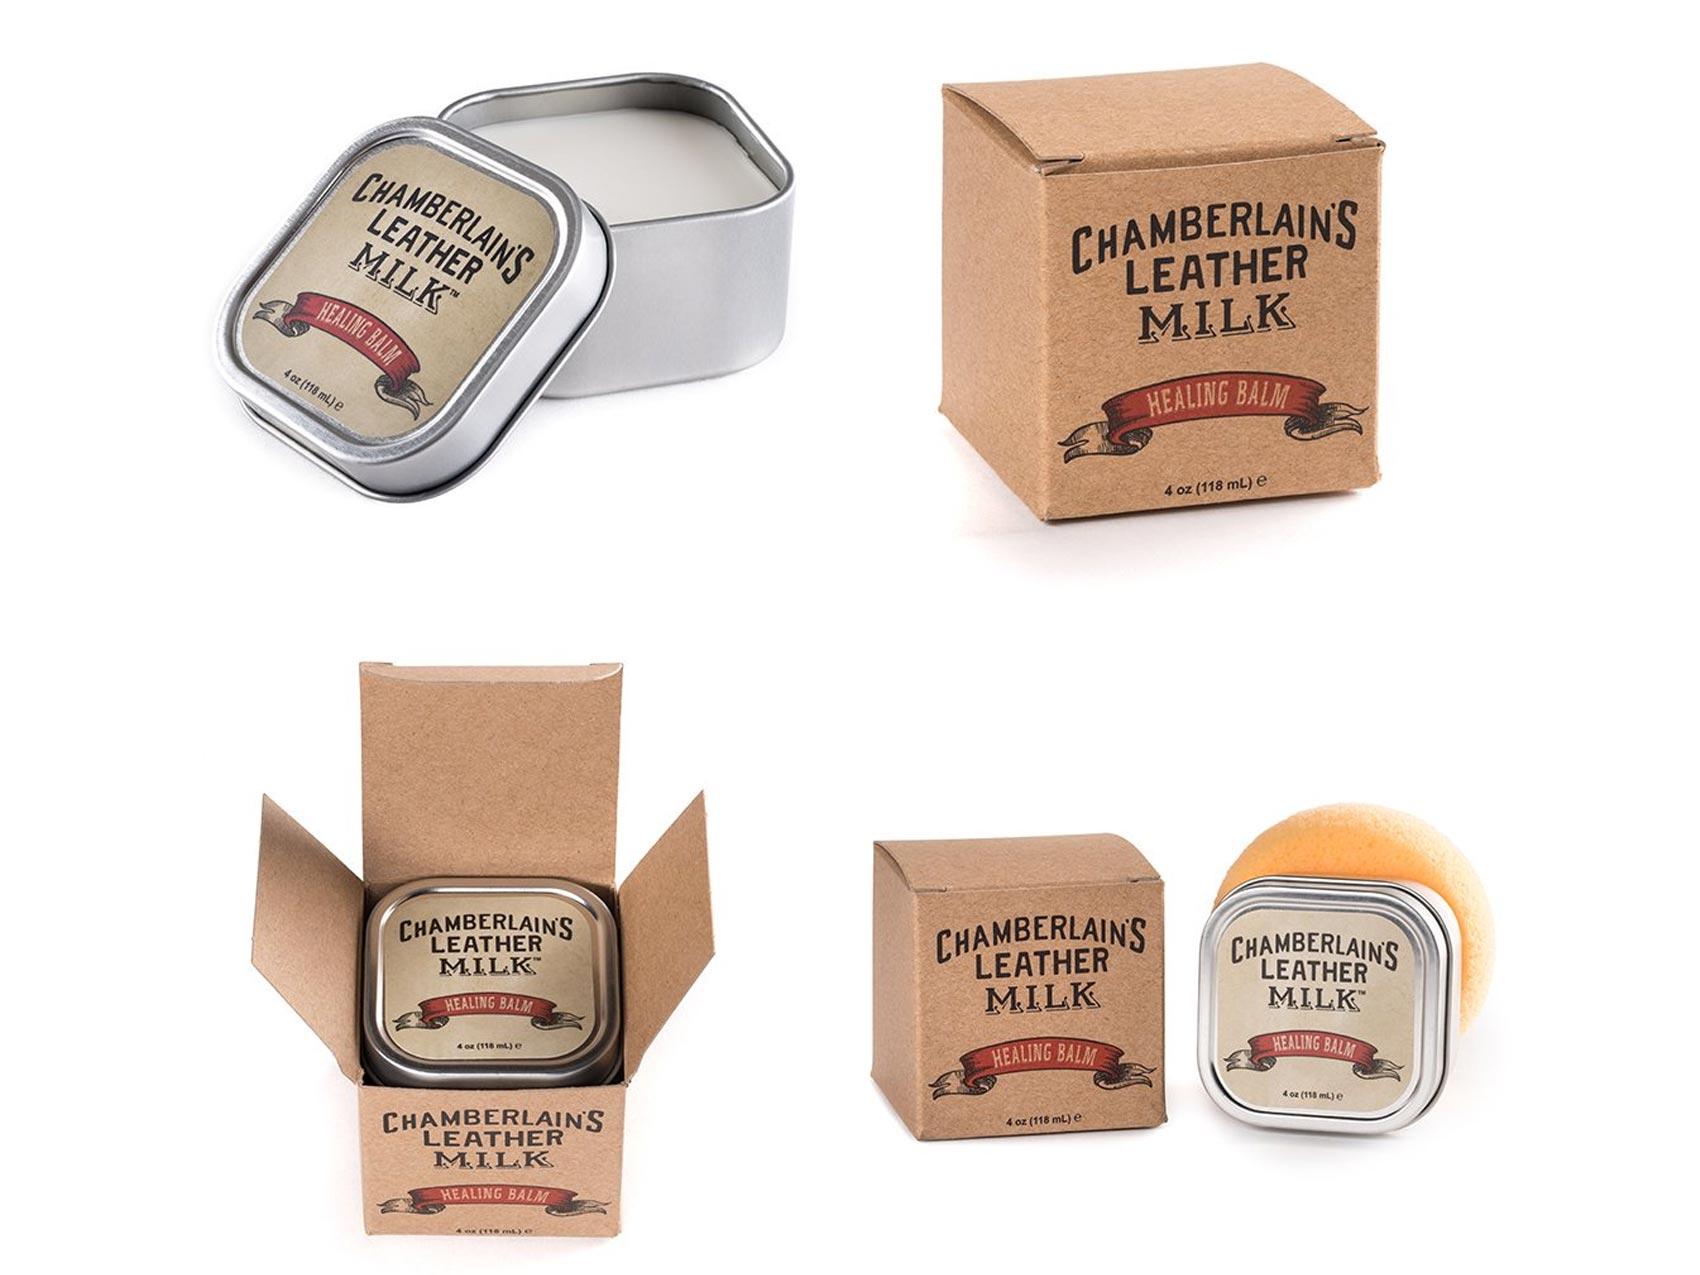 Chamberlains leather milk conditioner